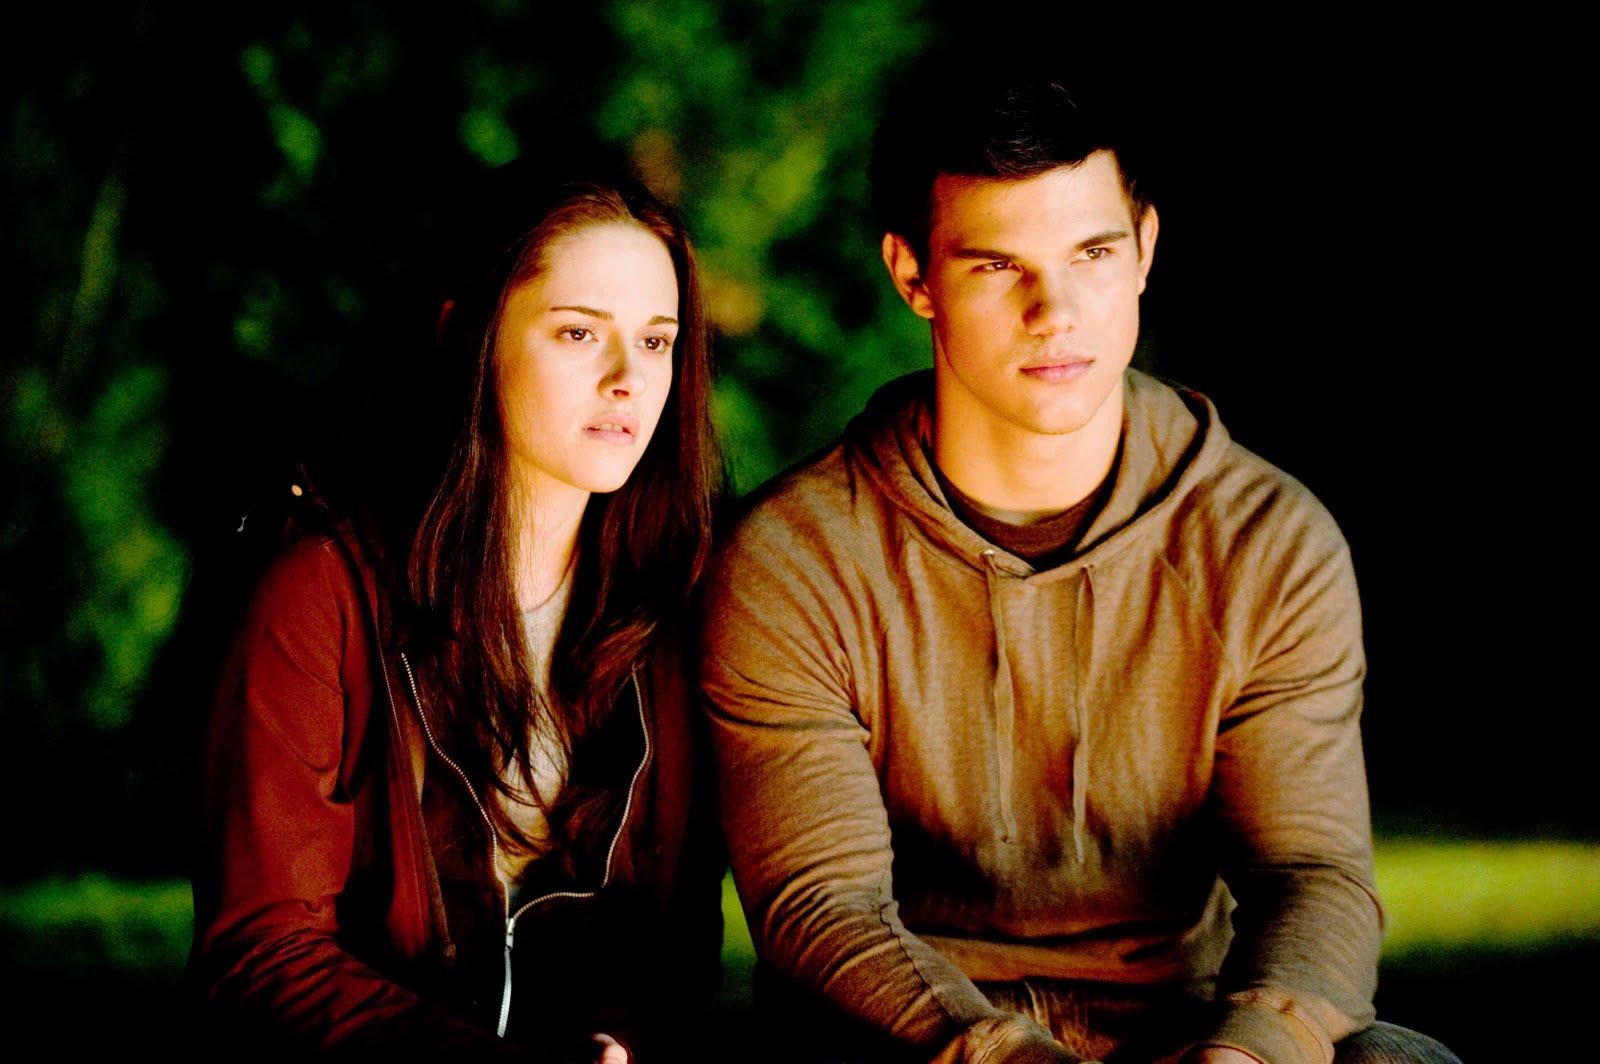 http://1.bp.blogspot.com/_RwYZJo_2o9c/TIUiB7E-dFI/AAAAAAAAB4w/PLOA2DLfaRM/s1600/Kristen-Stewart-and-Taylor-Lautner-The-Twilight-Saga-Eclipse.jpg